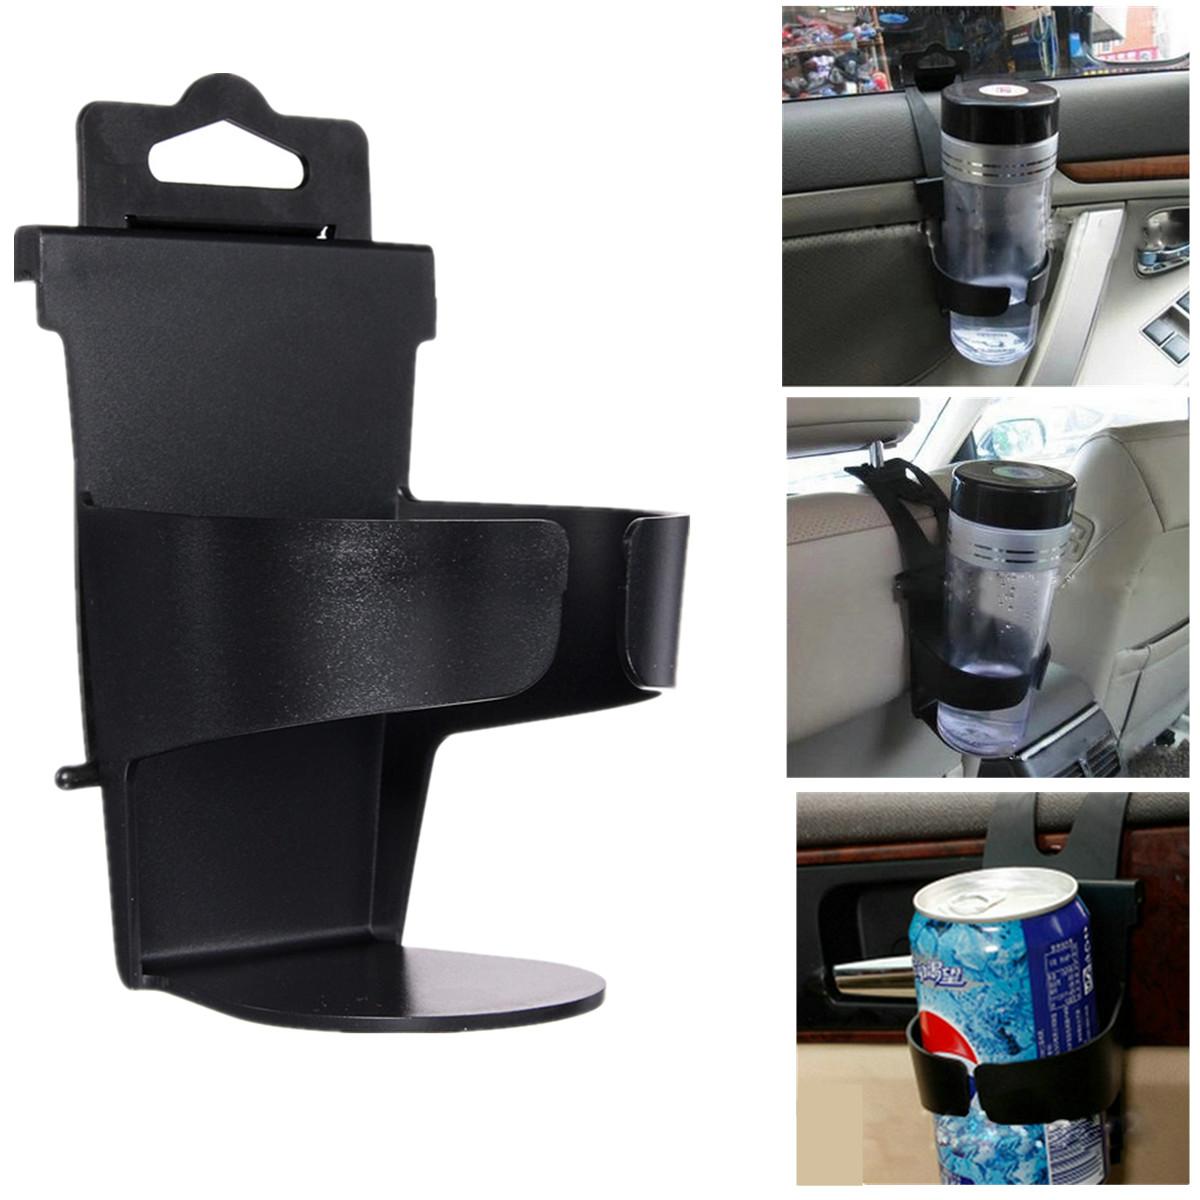 Universal Vehicle Car Truck Door Mount Drinks Bottle Cup Holder Stand Black от Banggood INT